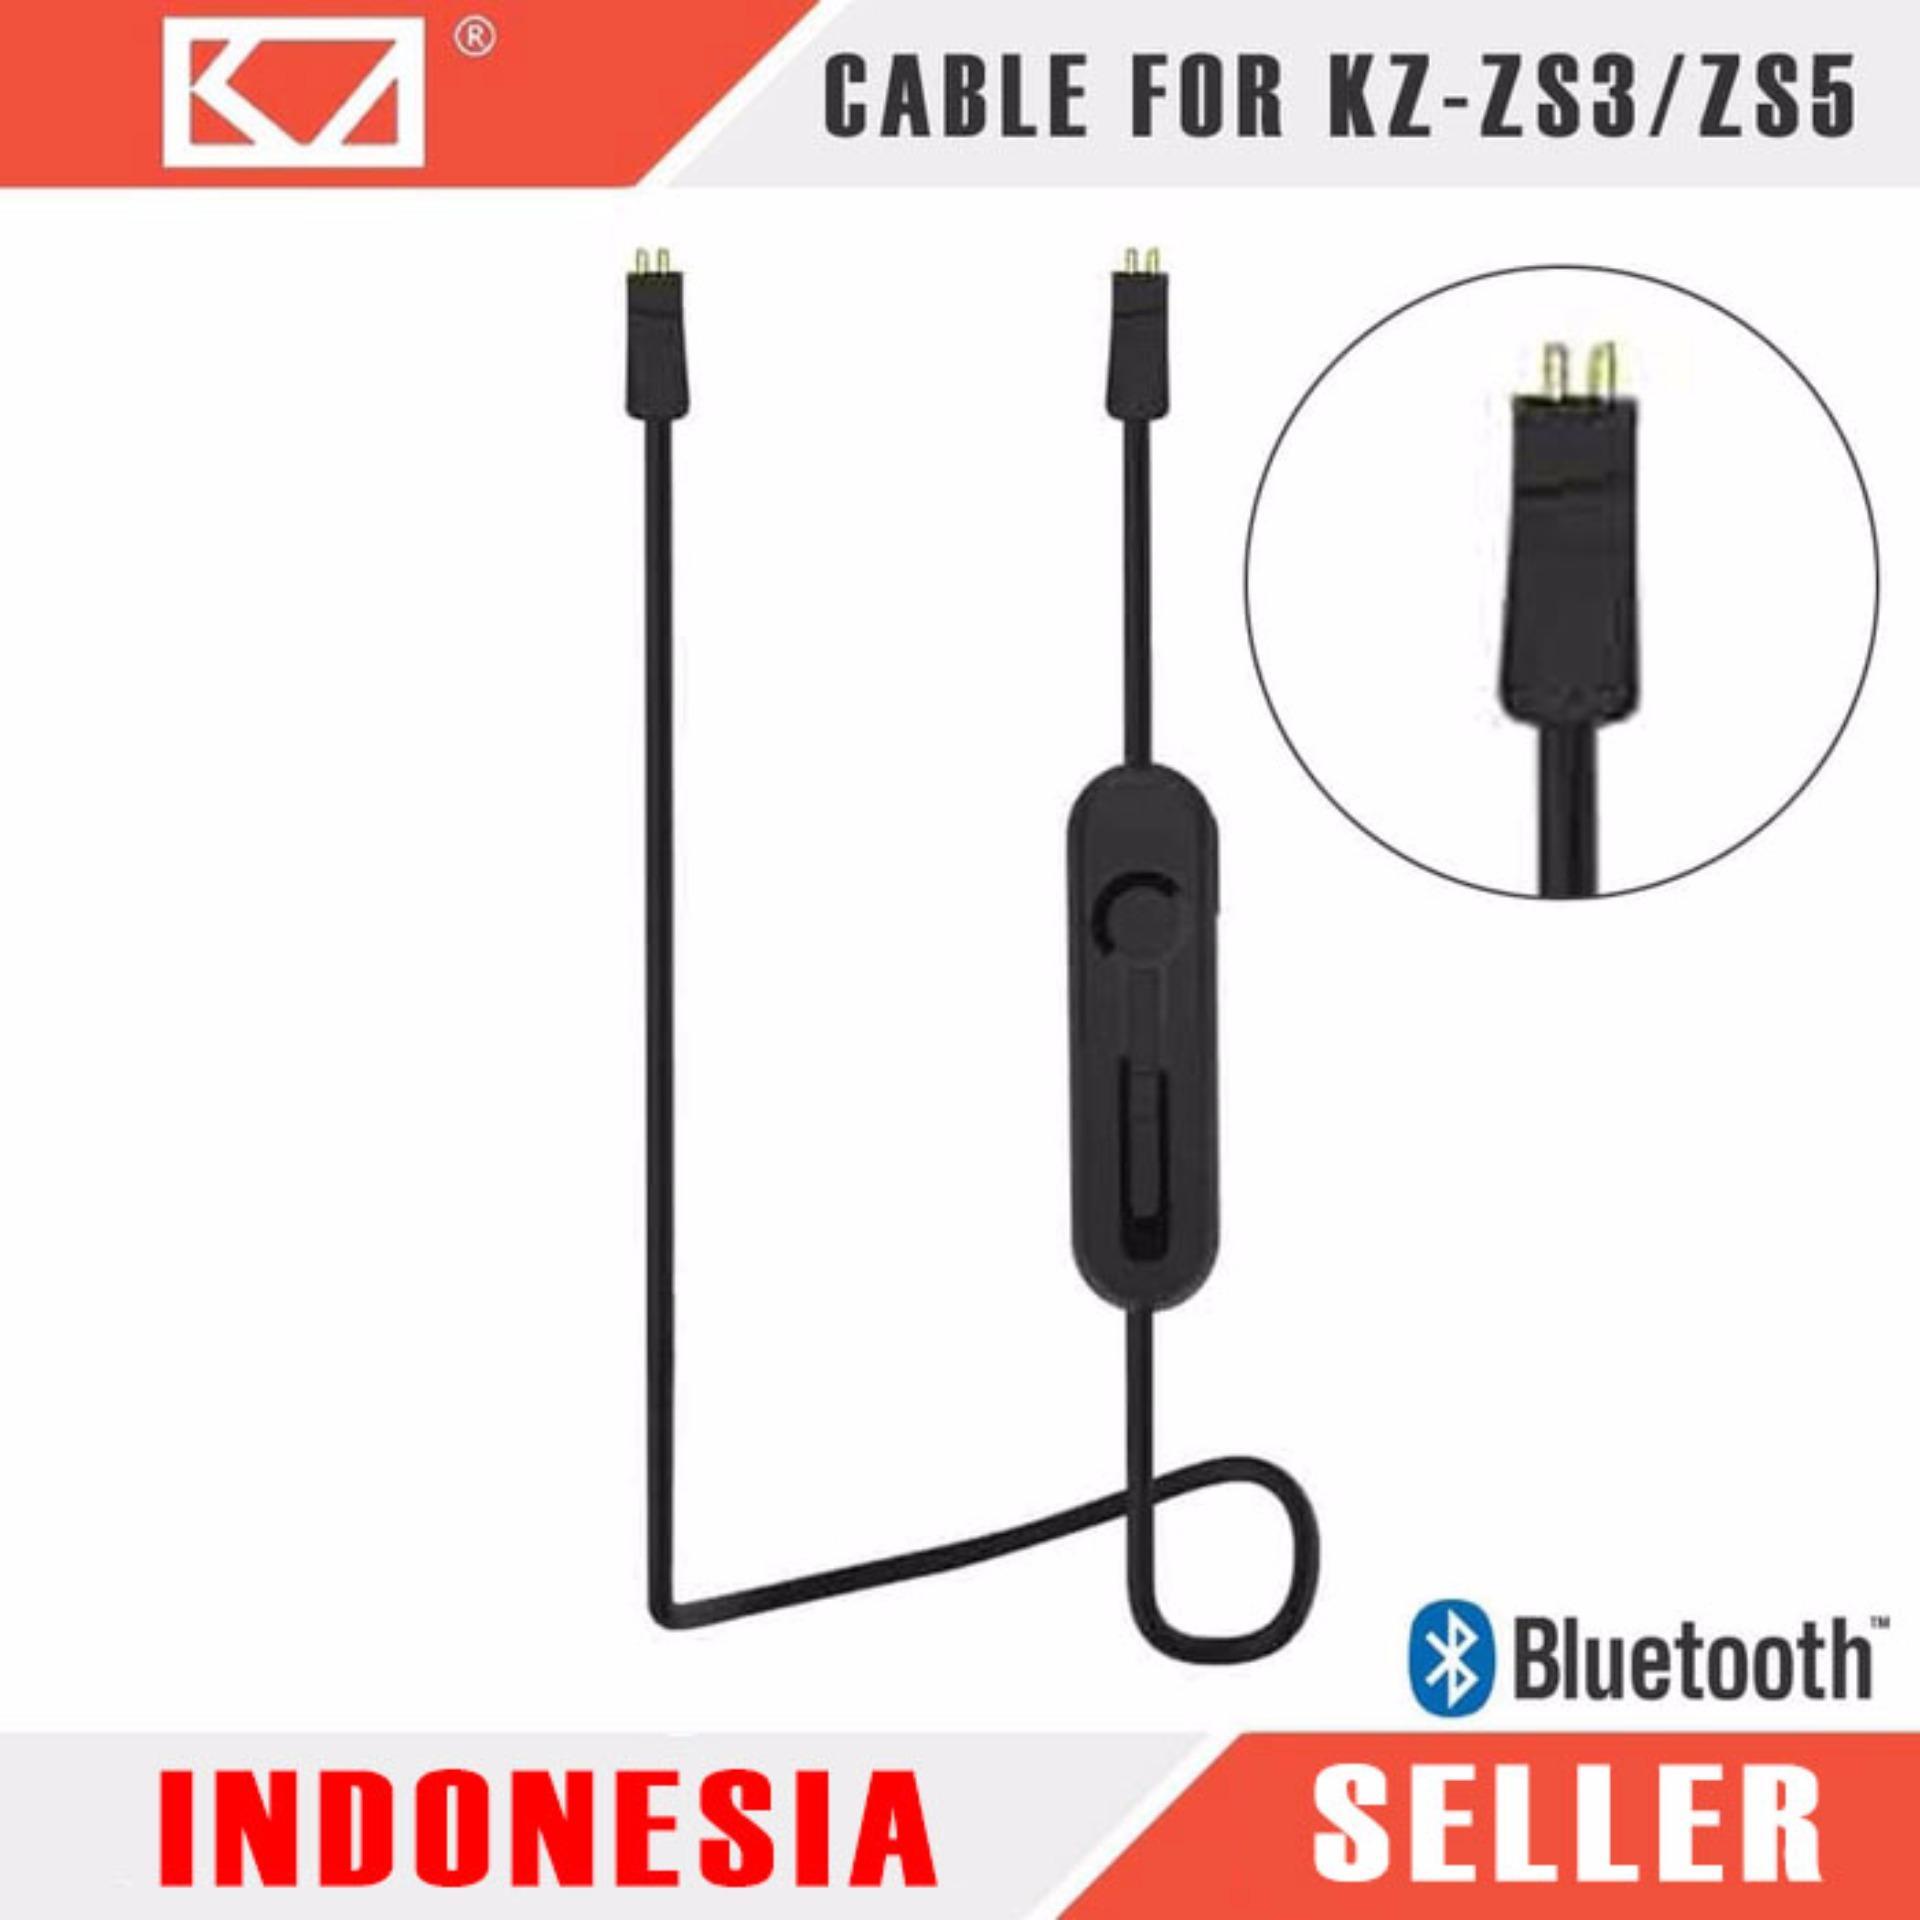 Knowledge Zenith Earphone Sport Dengan Mic Kz Zs3 Black Daftar Headset Bluetooth 41 Aptx Lossless Hdse Detail Gambar Acoustics Original Kabel Untuk Zs5 Zs6 Hitam